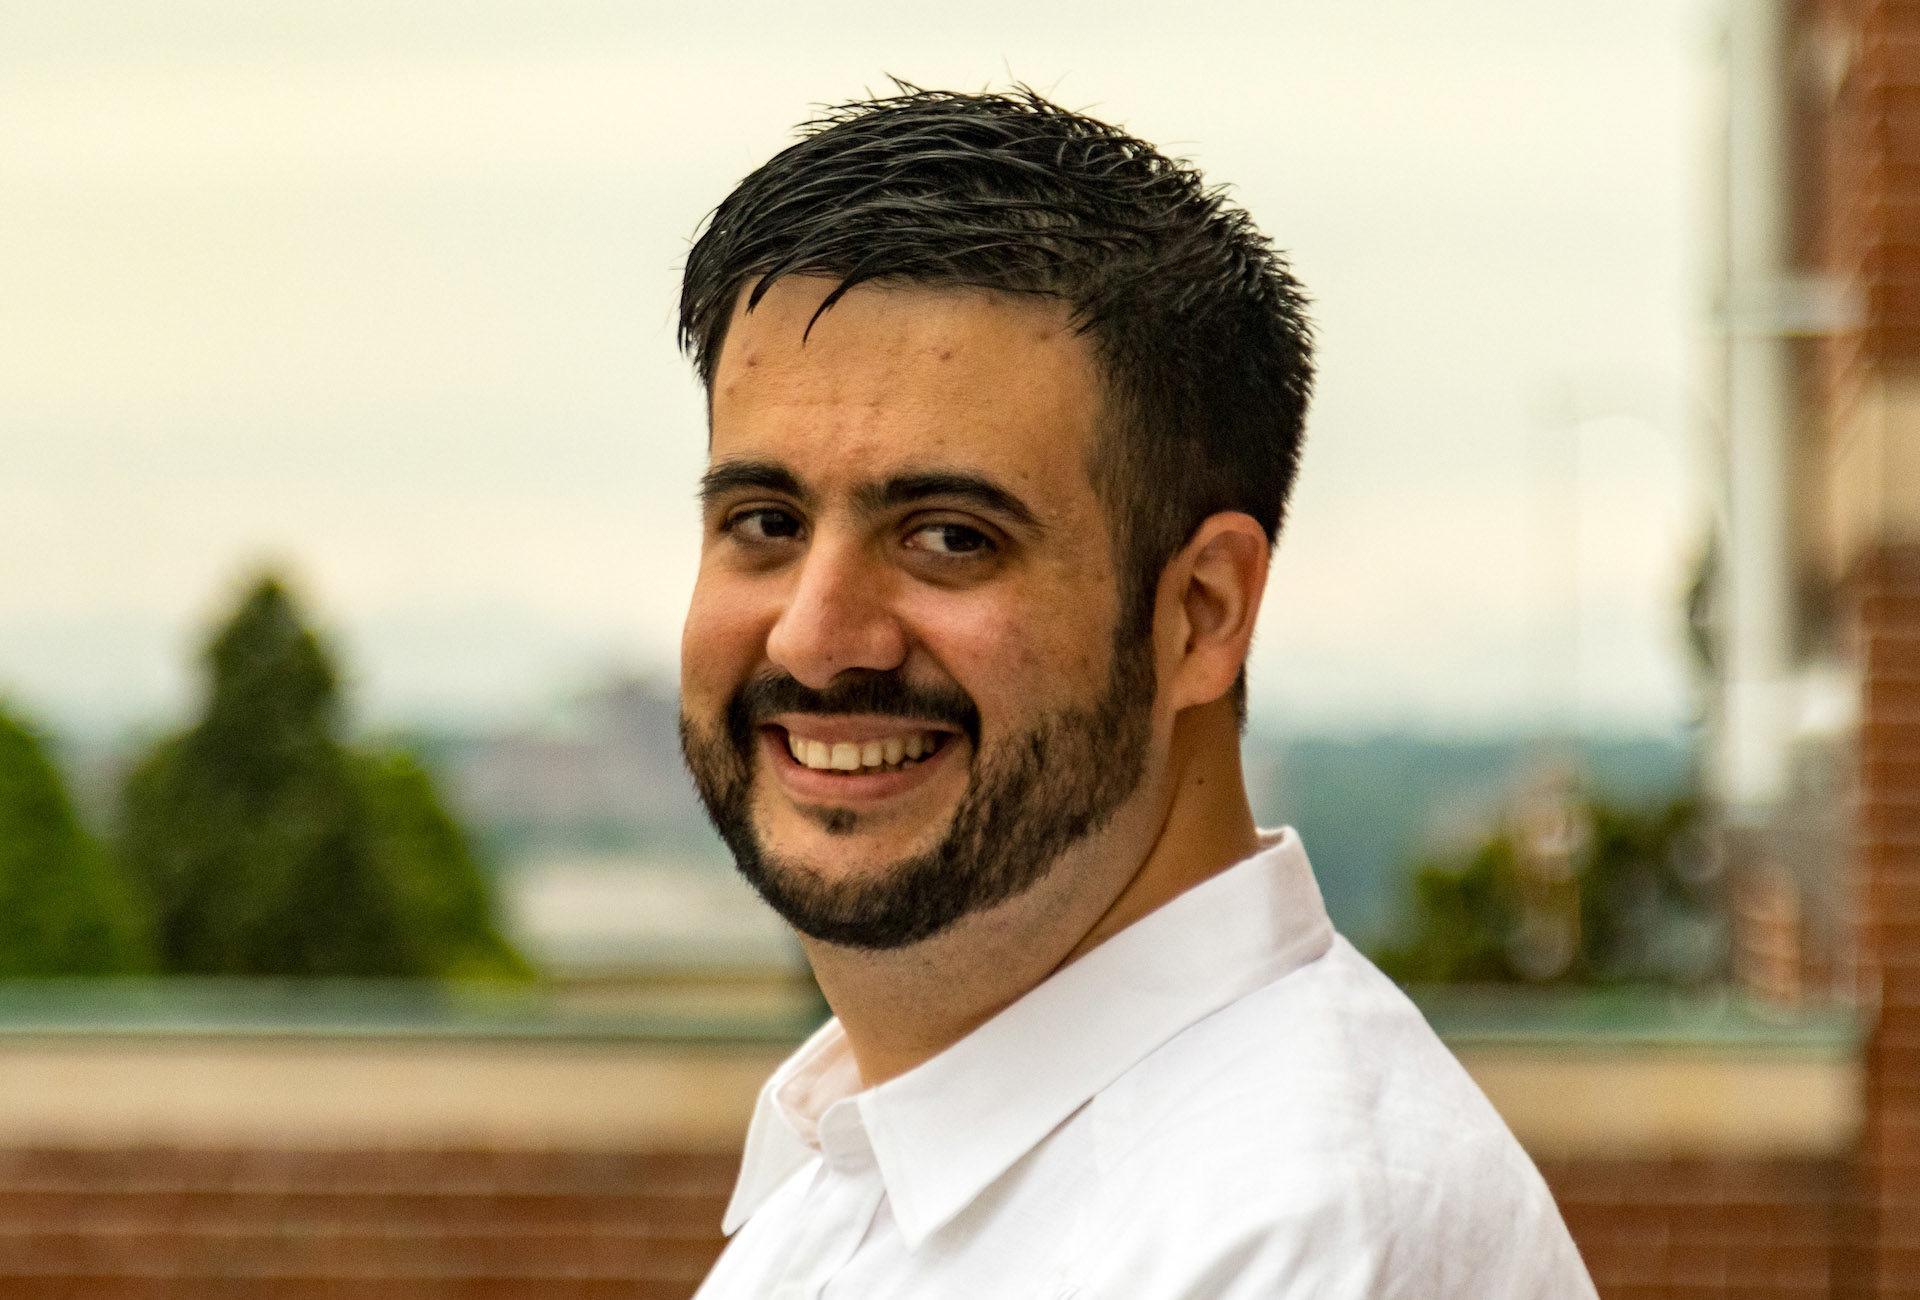 Entrevista a Usama Bilal, epidemiólogo urbano.